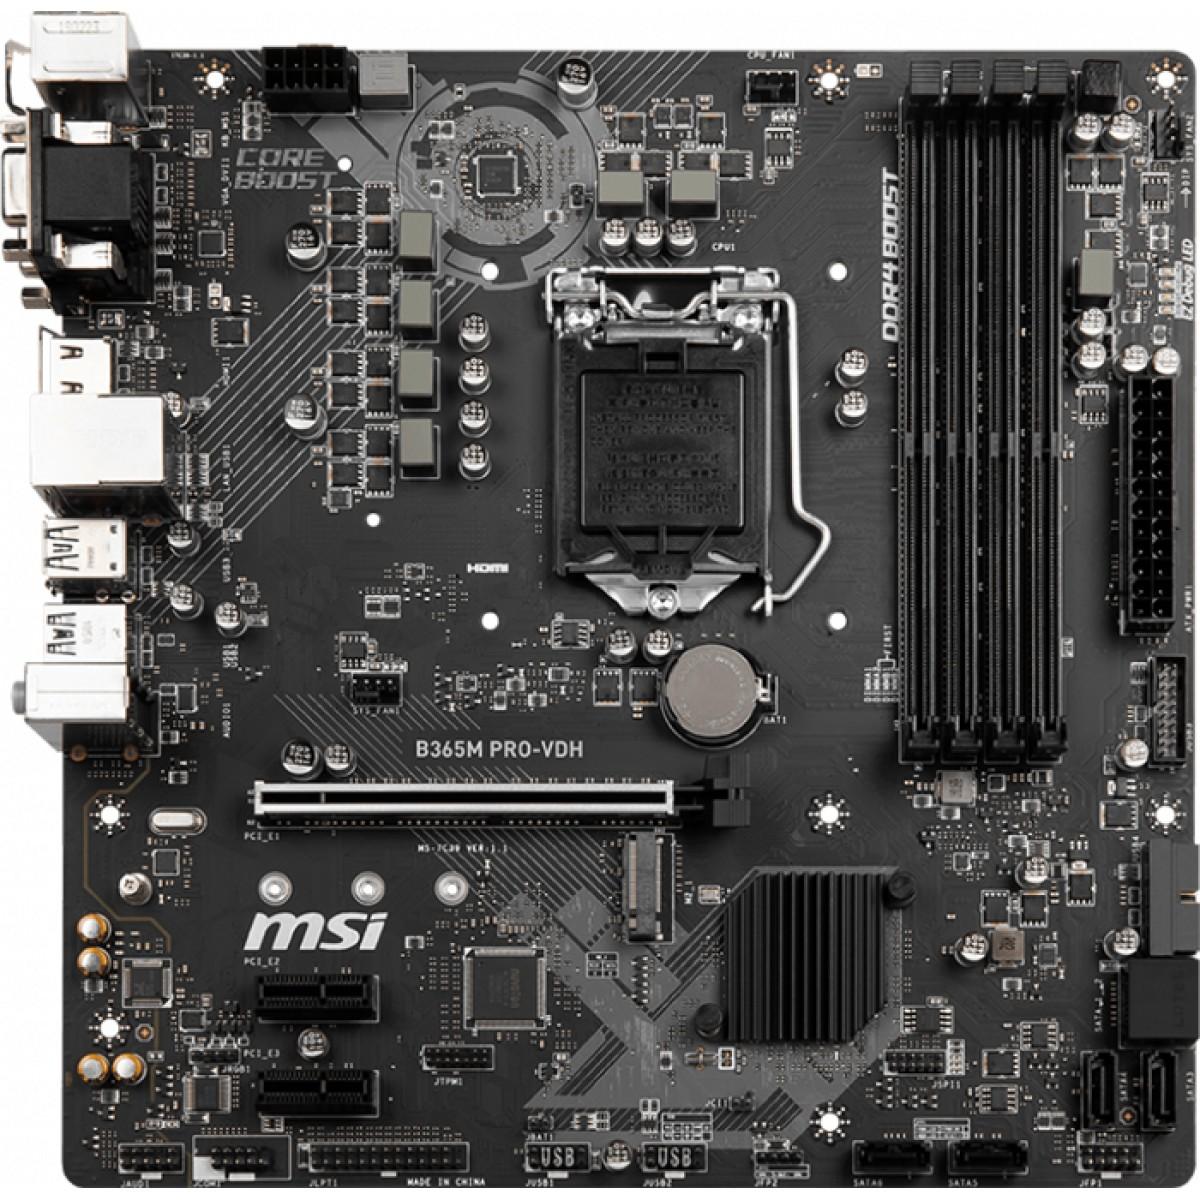 Placa Mãe MSI B365M PRO-VDH, Chipset B365, LGA 1151, mATX, DDR4